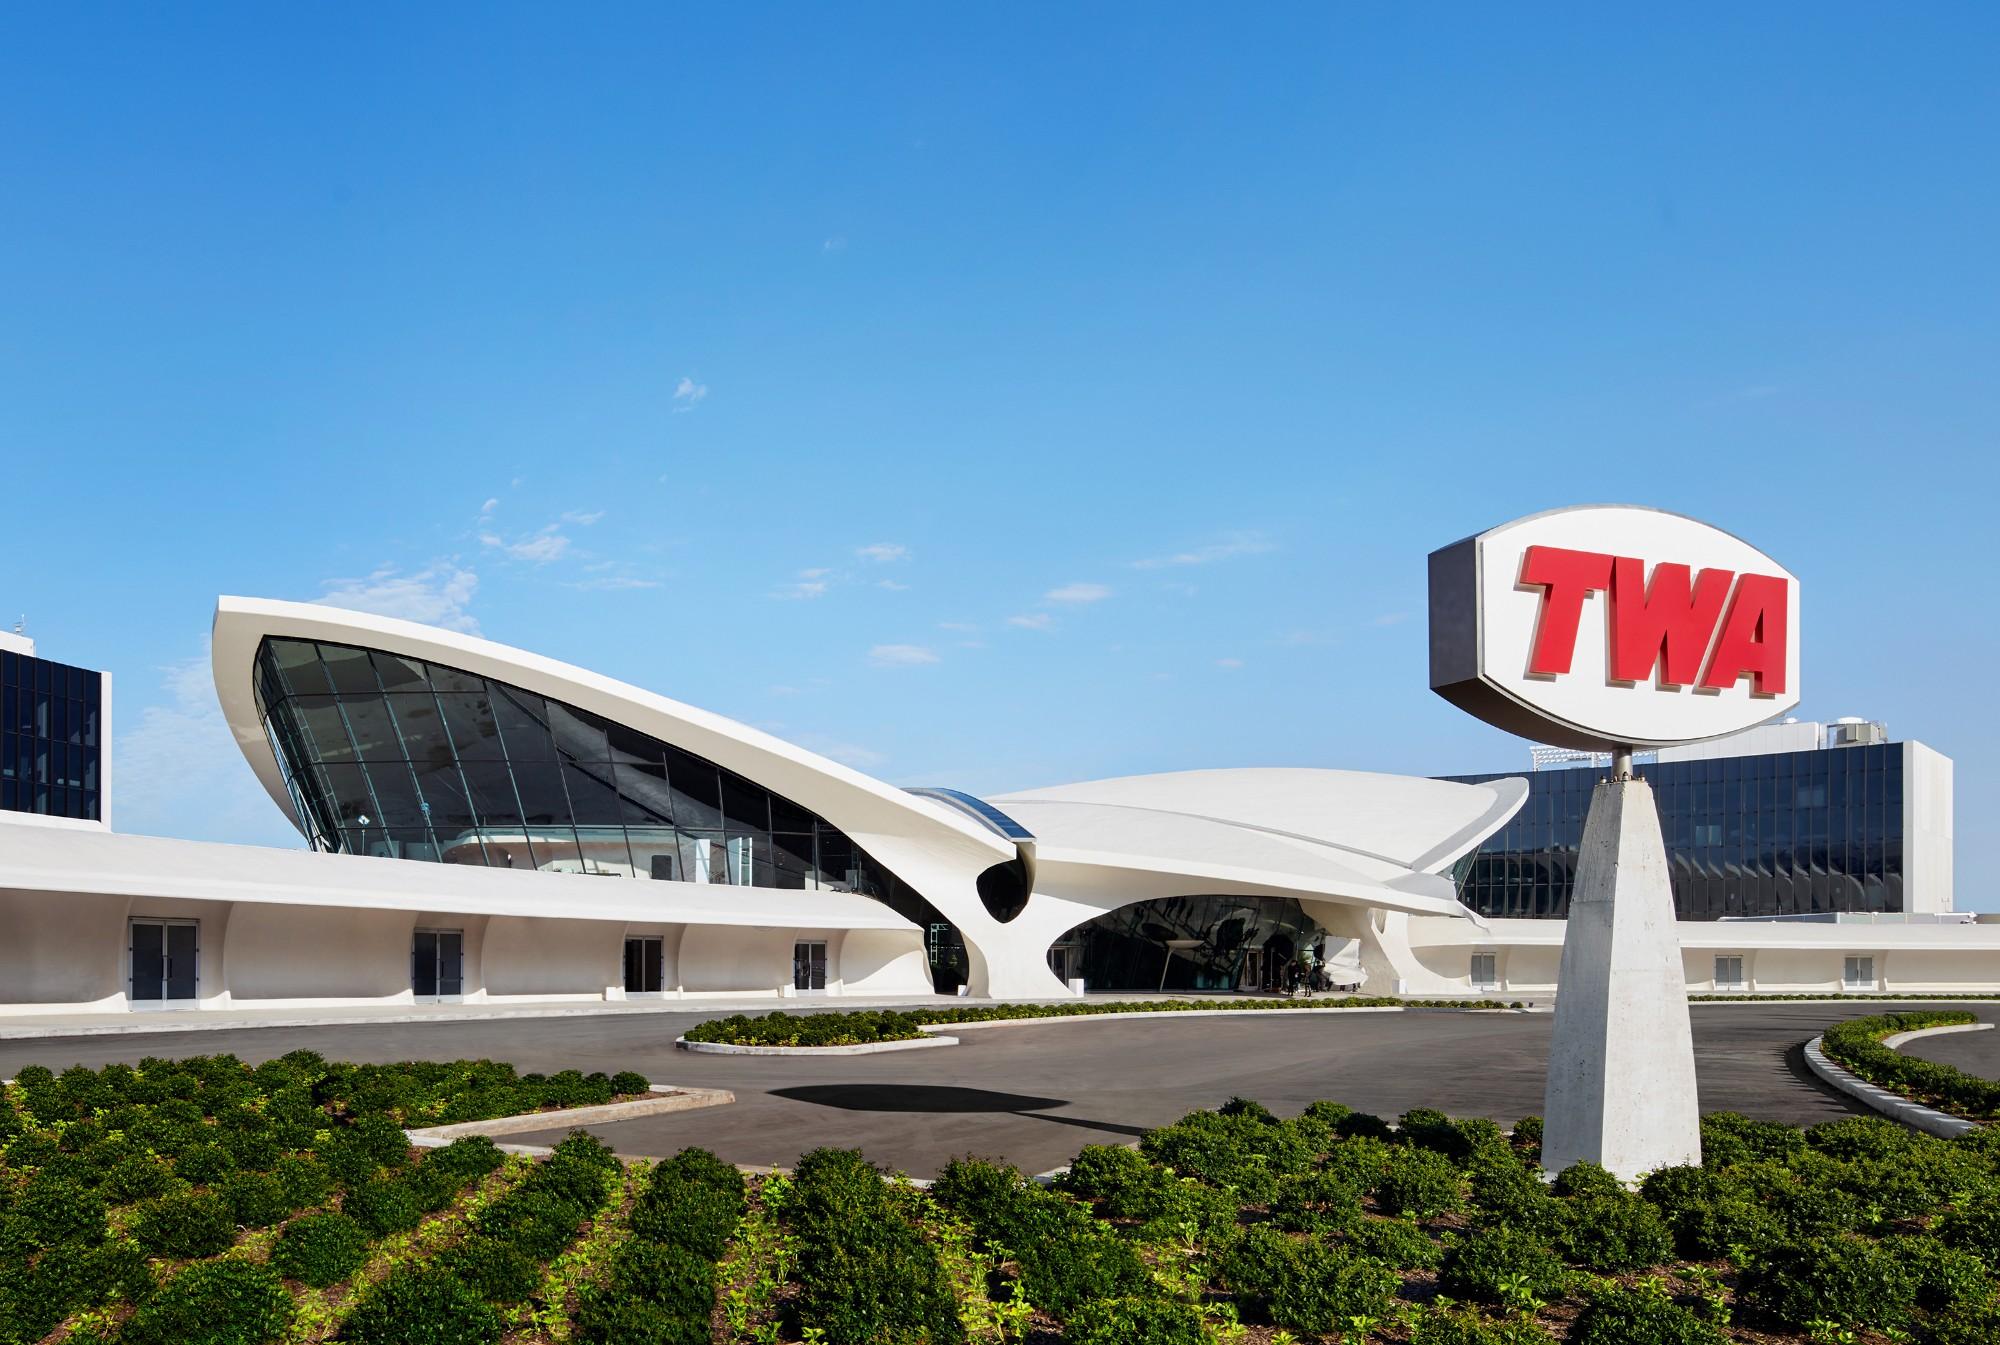 TWA Hotel, TWA, JFK Airport